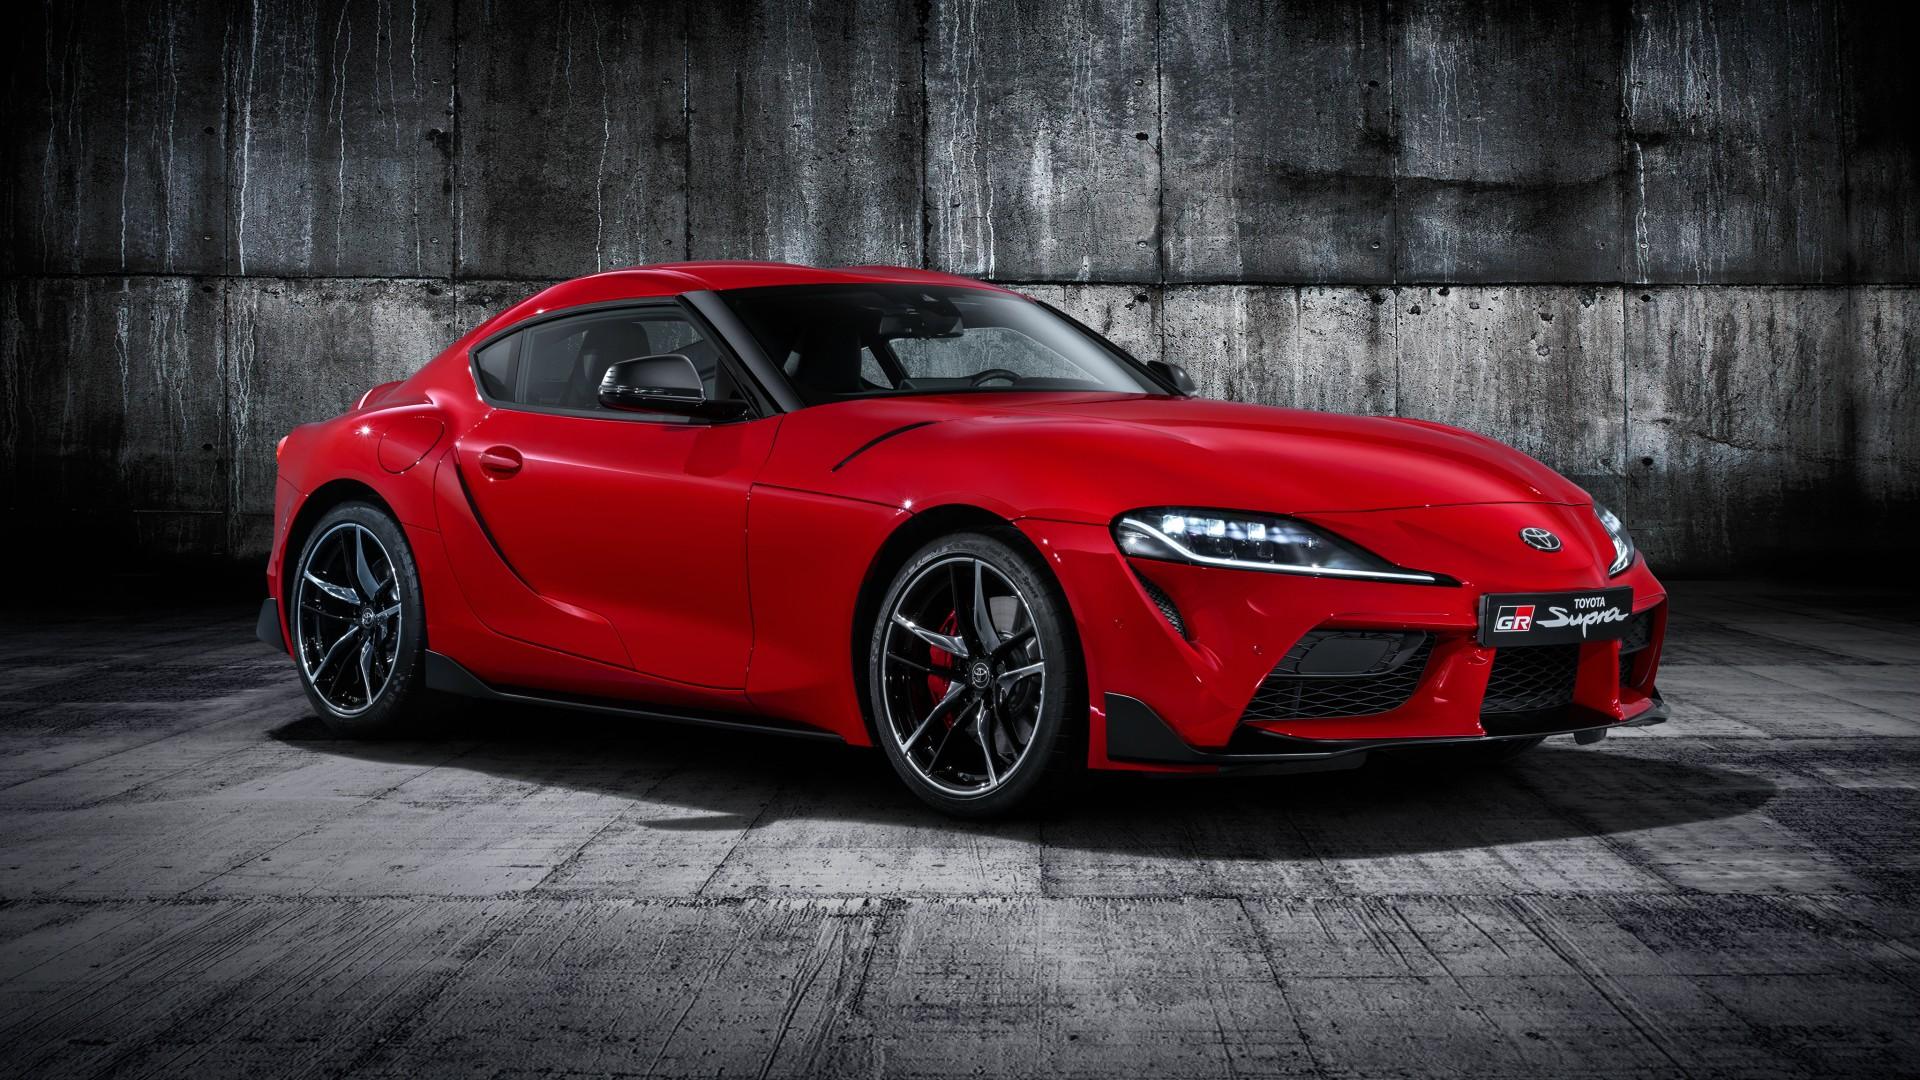 Toyota Gr Supra 2019 4k Wallpaper